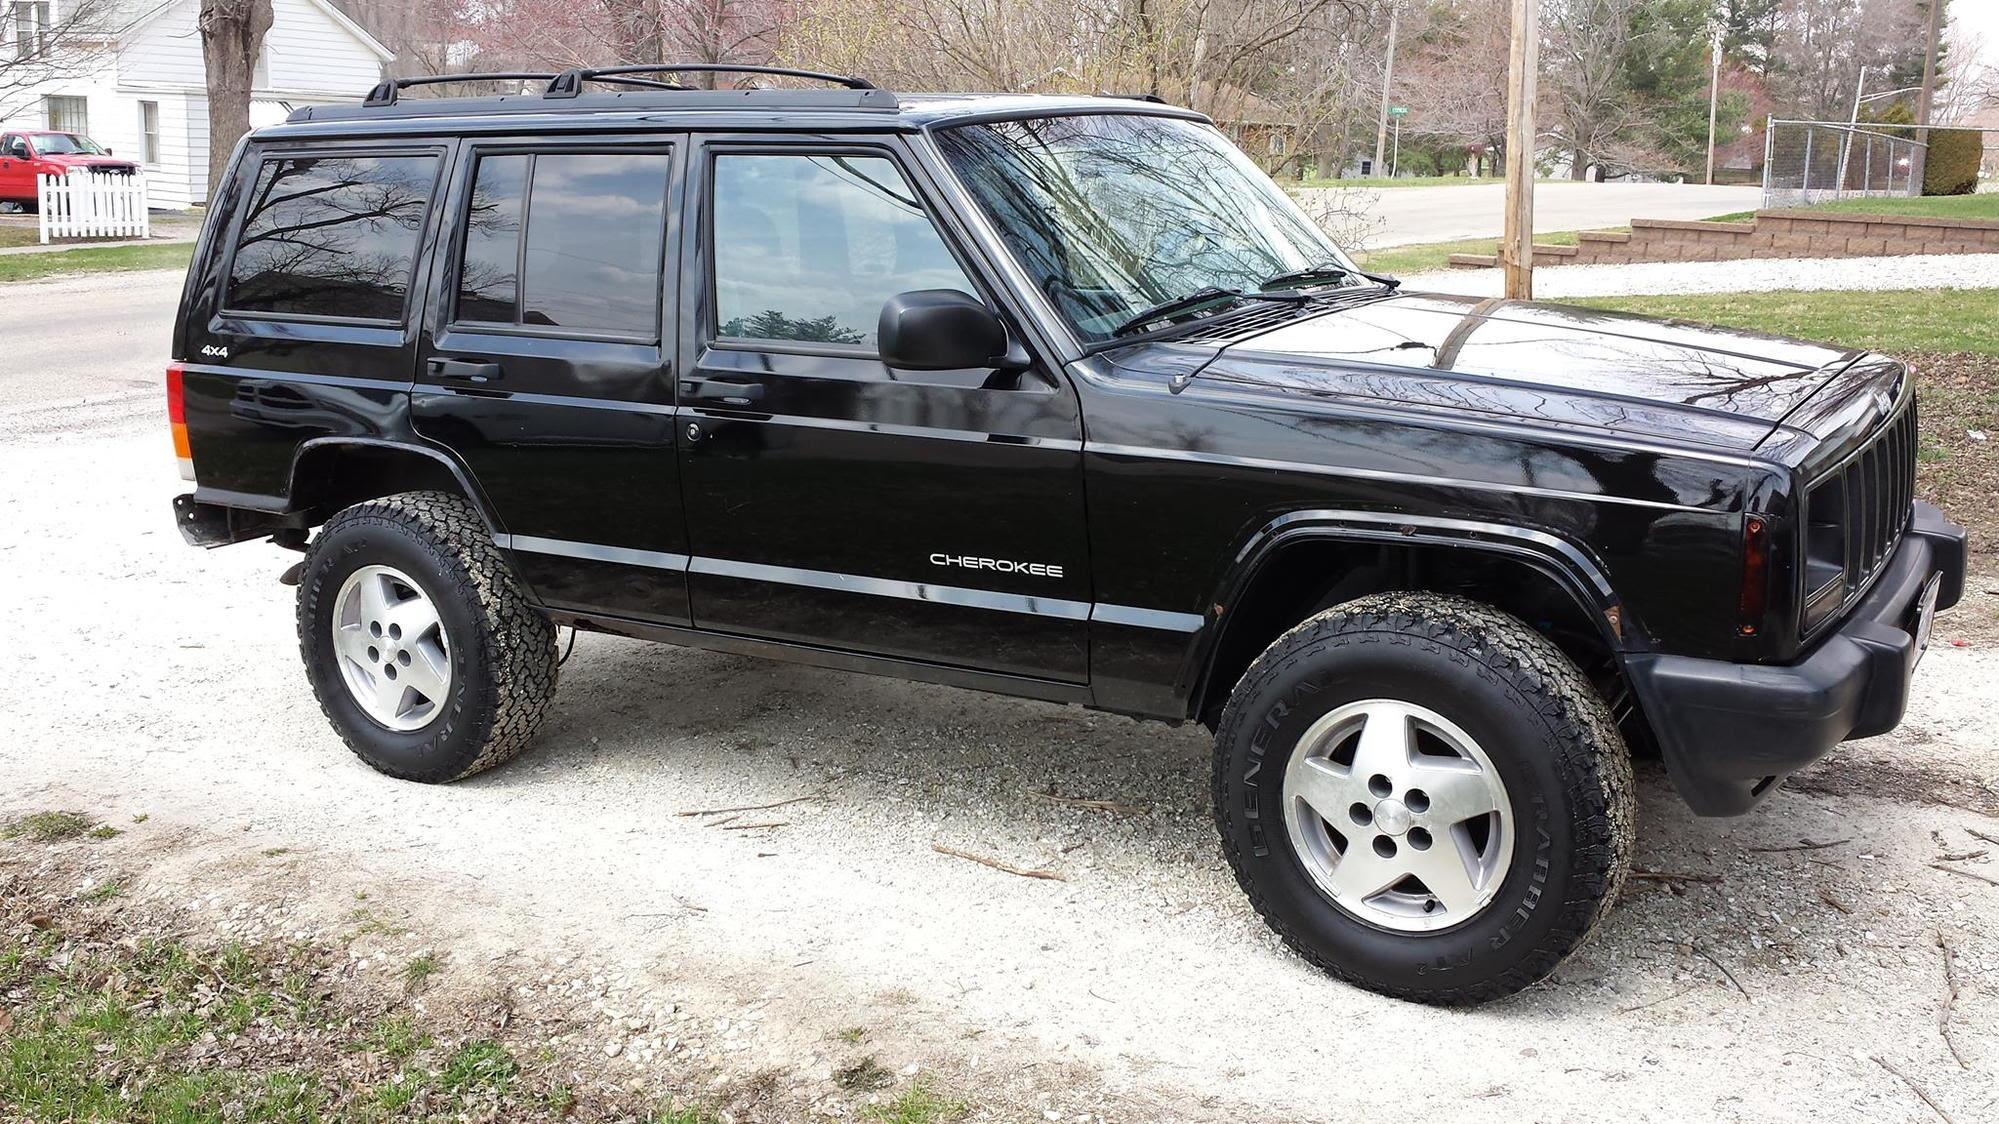 1997 jeep cherokee XJ - LS1TECH